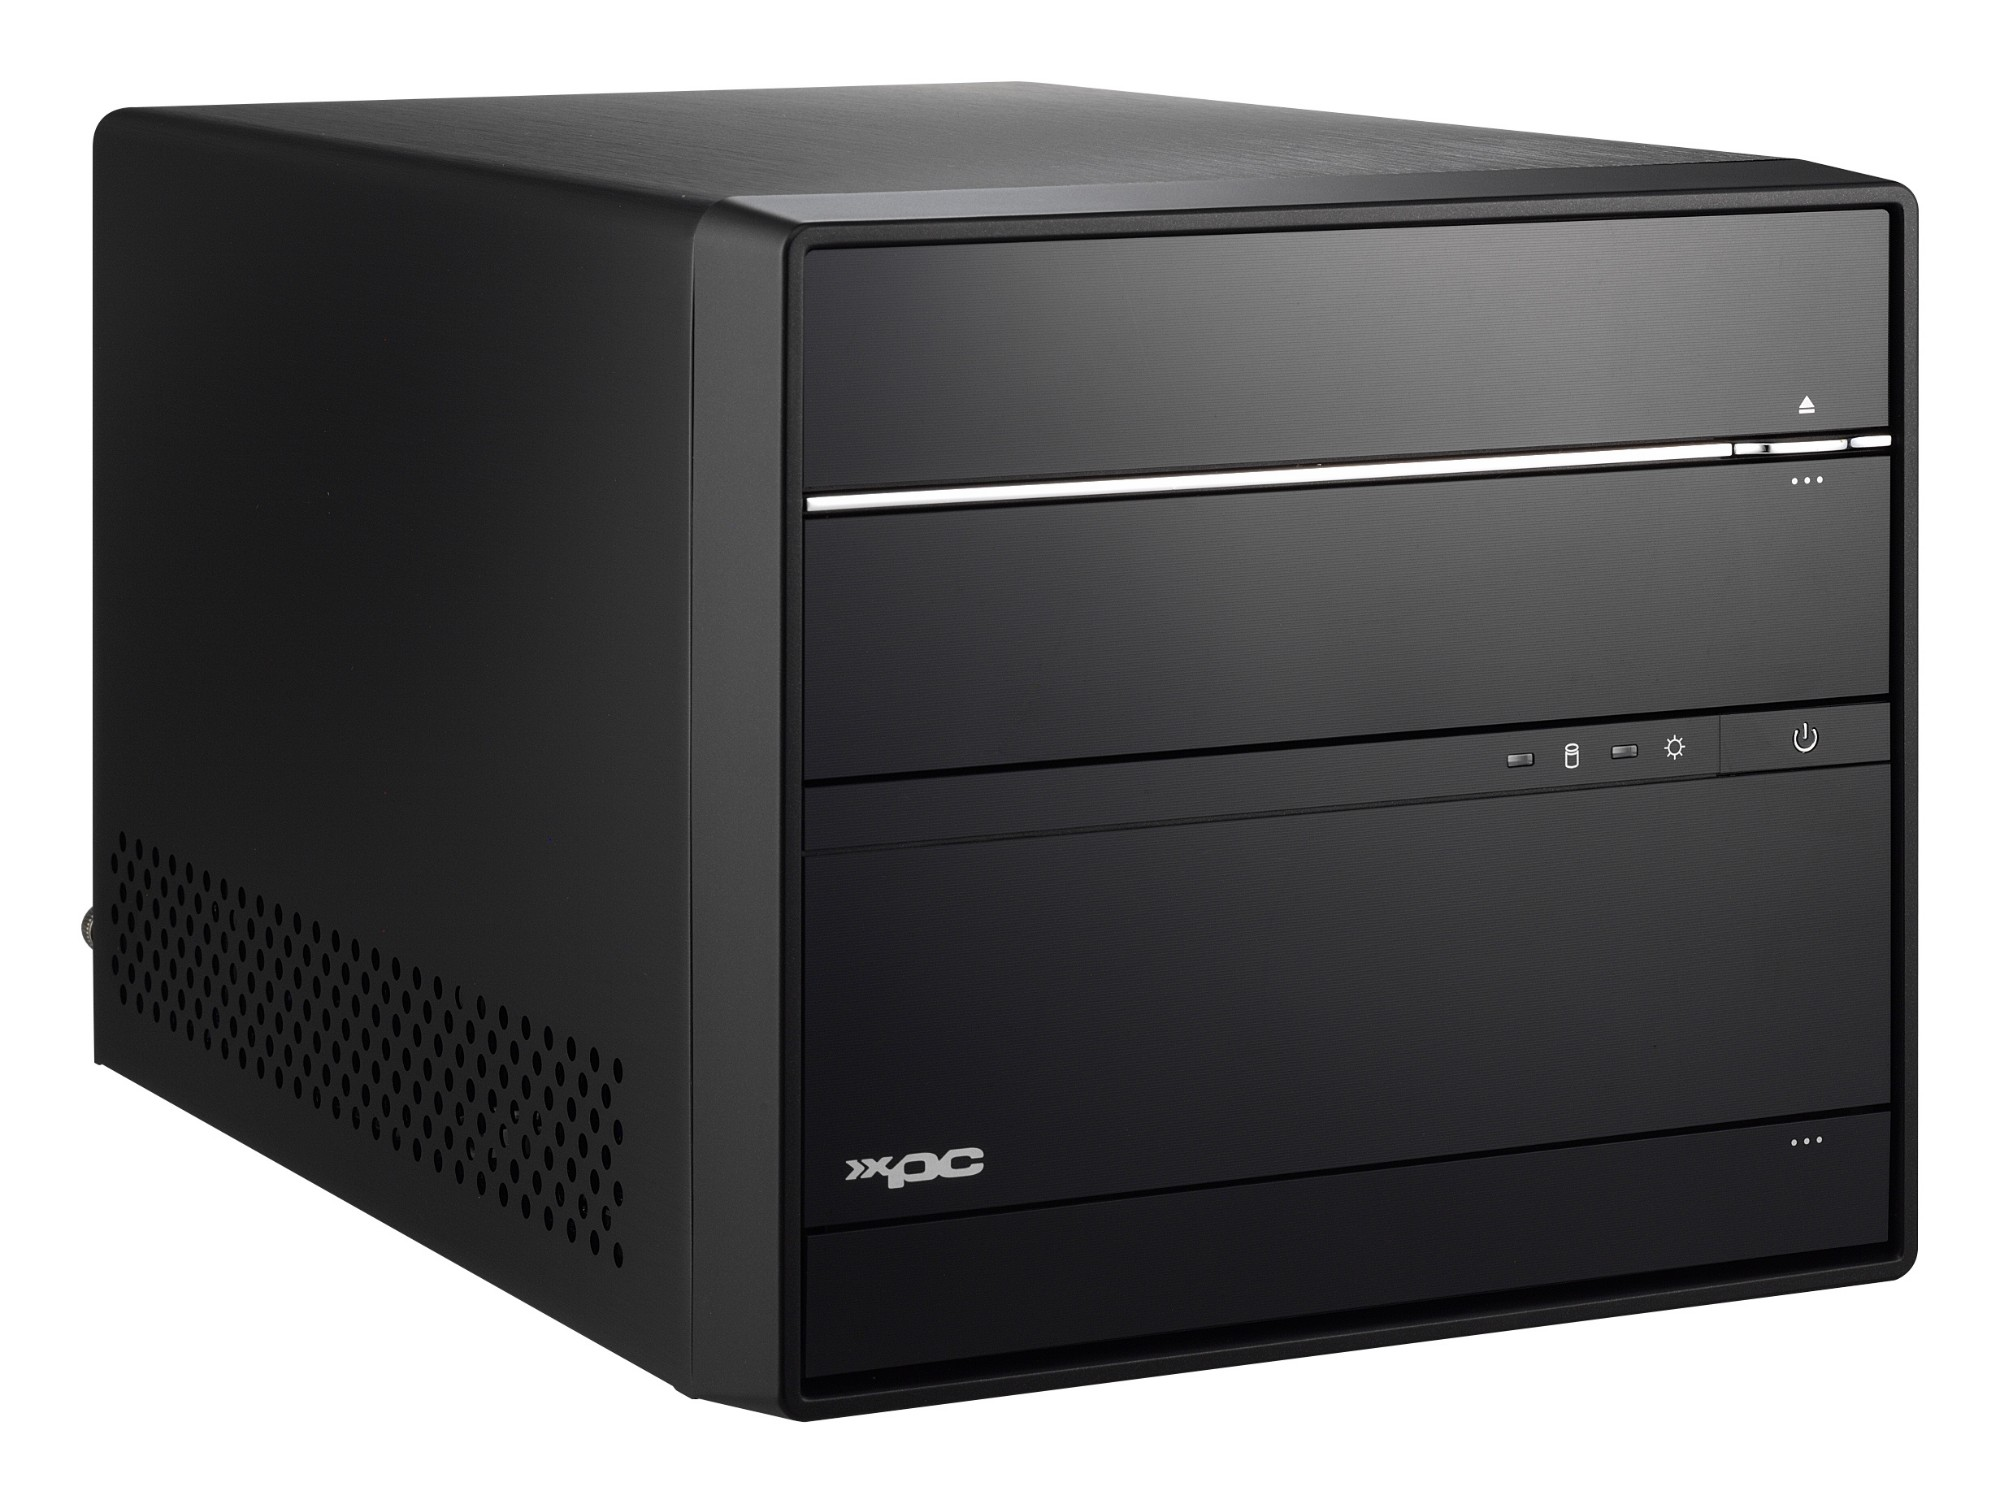 Shuttle SH170R6 Intel H170 LGA 1151 (Socket H4) Black PC/workstation barebone